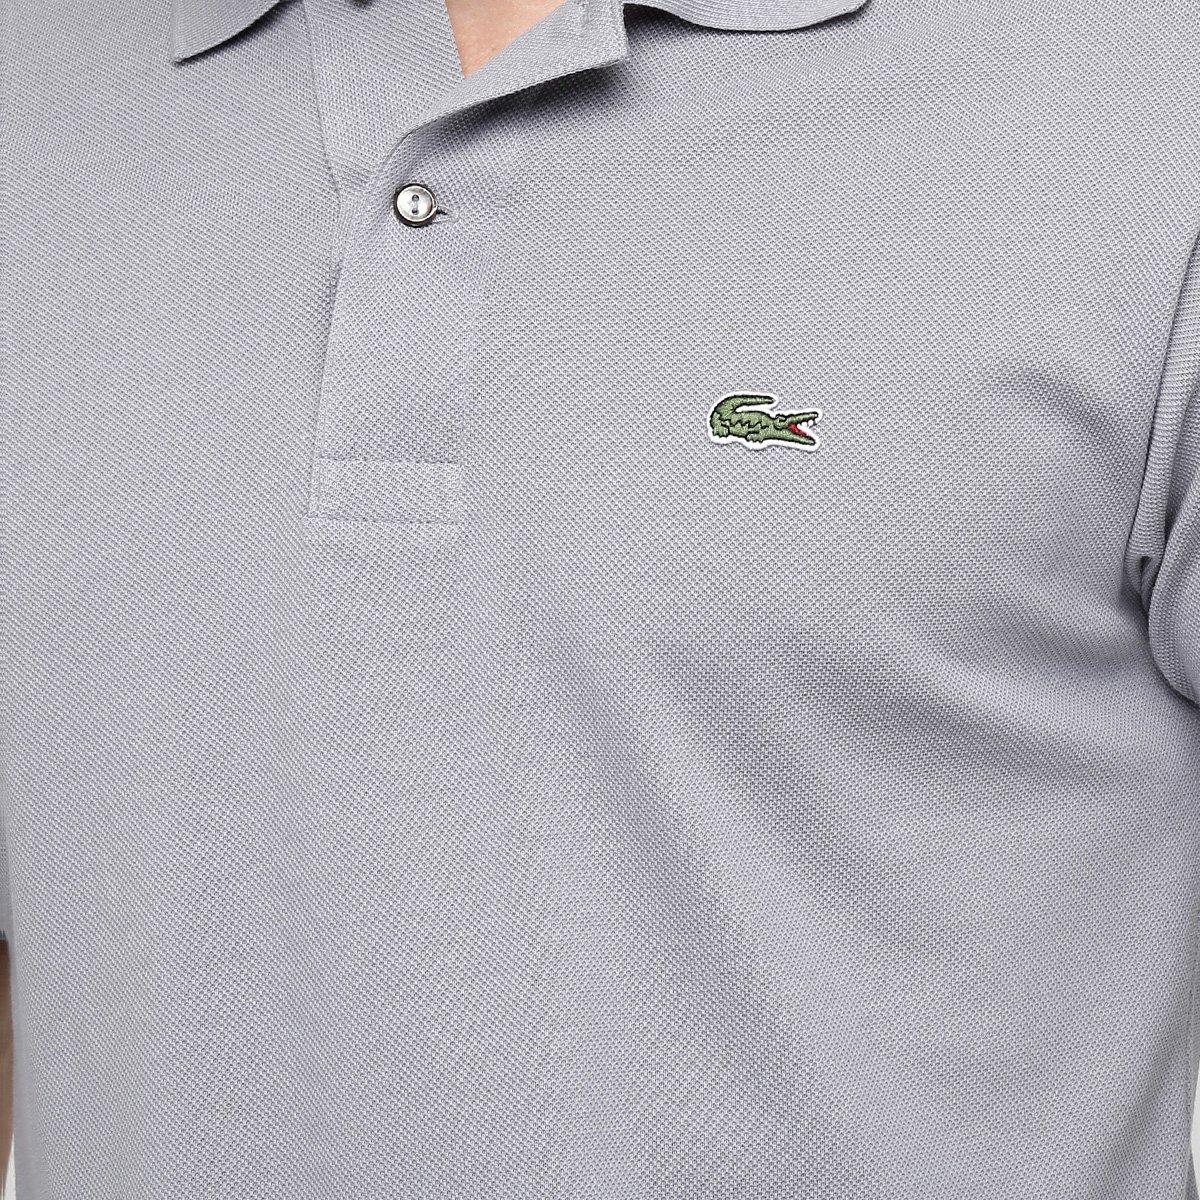 Camisa Polo Lacoste Original Fit Masculina - Cinza - Compre Agora ... 4d4ed3e264